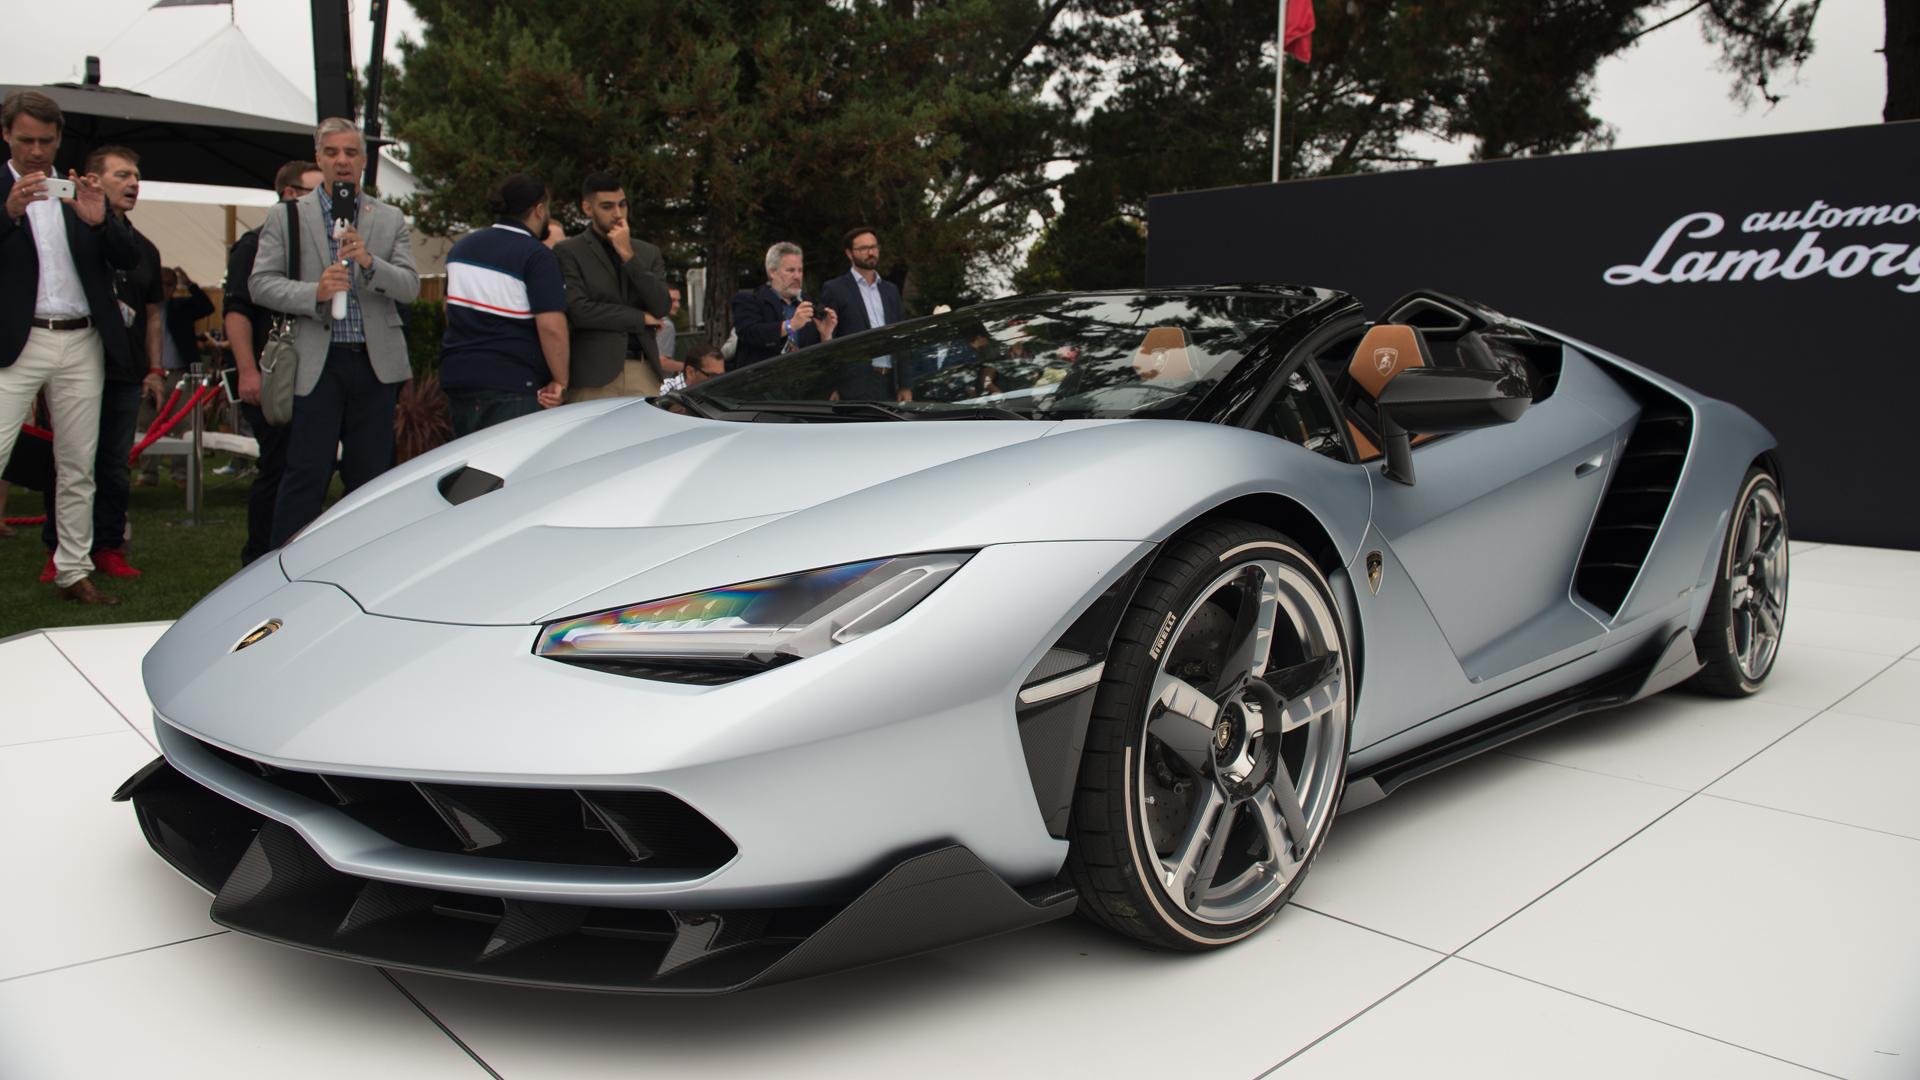 Lamborghini Has Issued A Recall On Its Ultra Rare Centenario